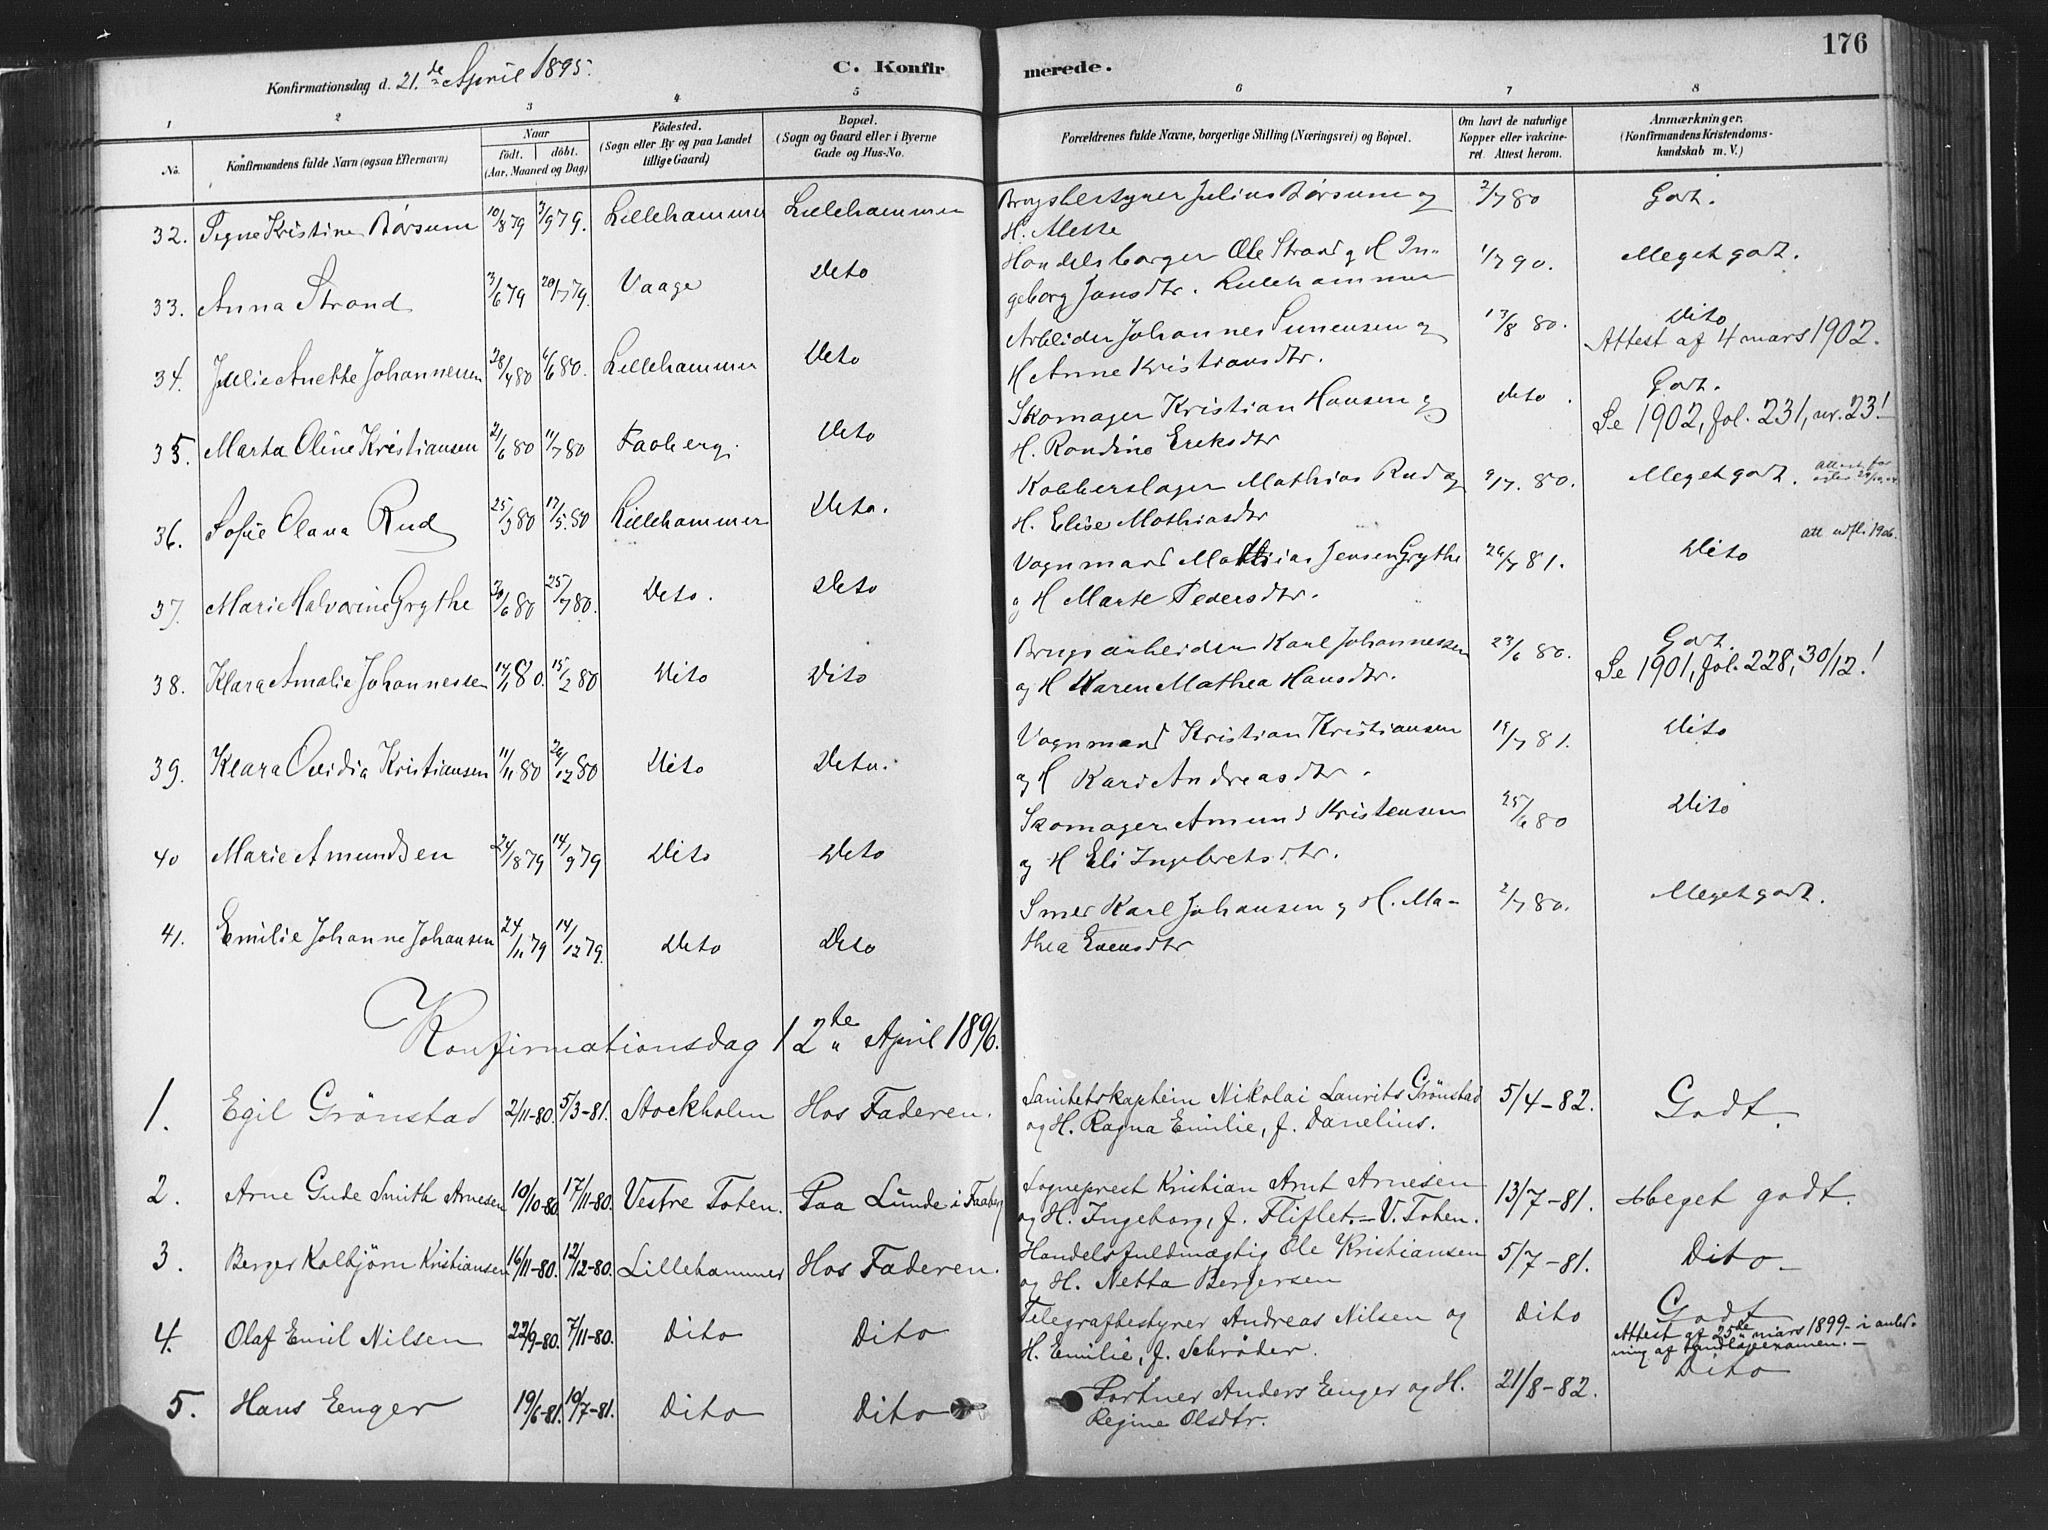 SAH, Fåberg prestekontor, Ministerialbok nr. 10, 1879-1900, s. 176